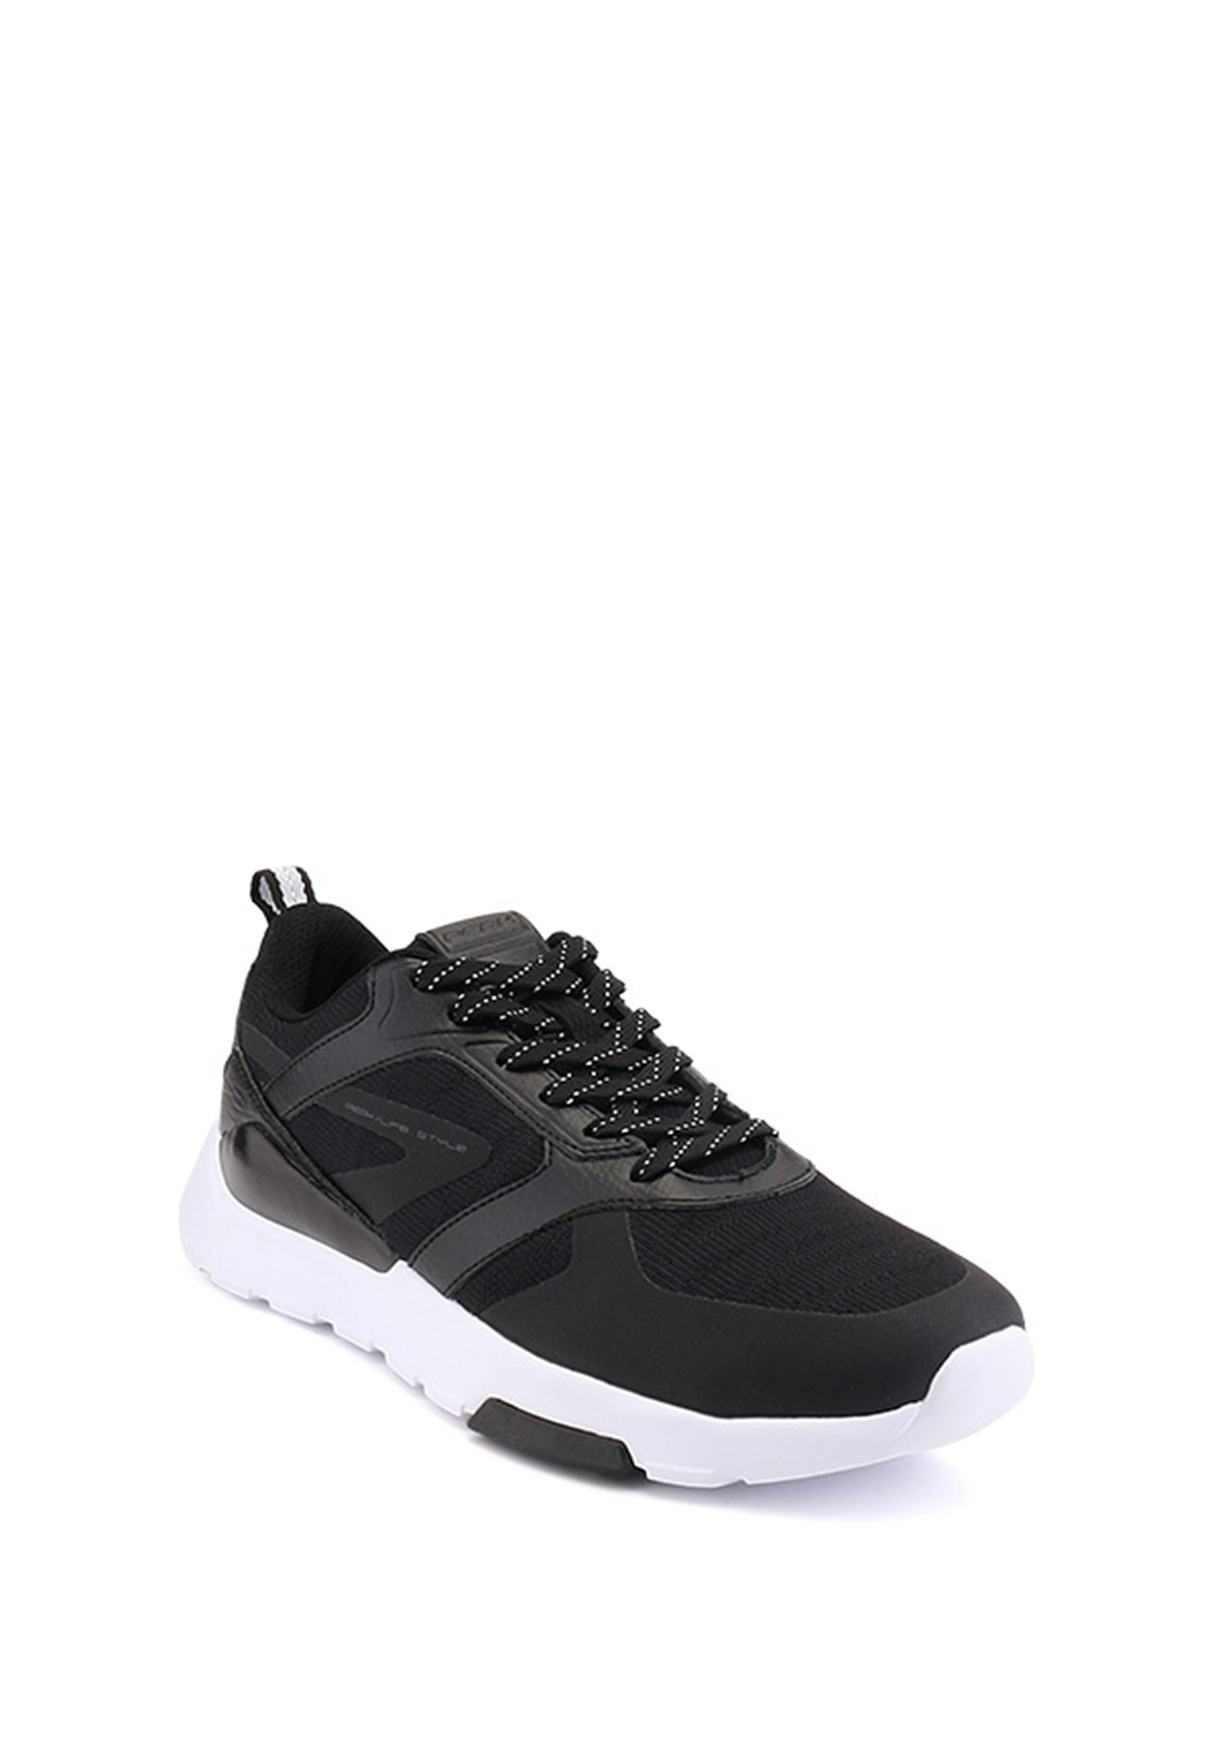 Retro Casual Shoes